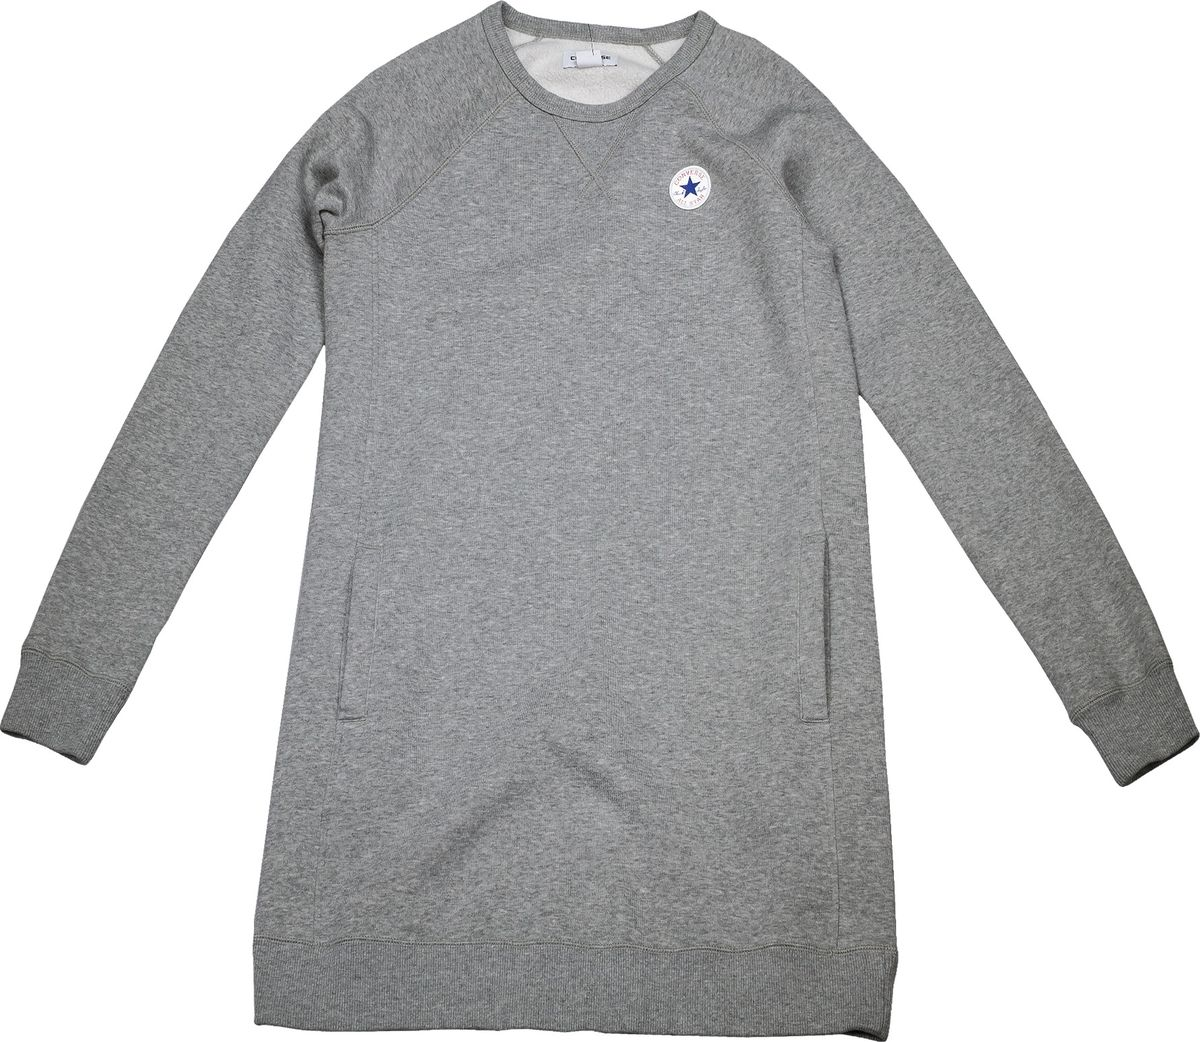 Платье женское Converse Core Sweatshirt Dress, цвет: серый. 10004545035. Размер L (48)10004545035